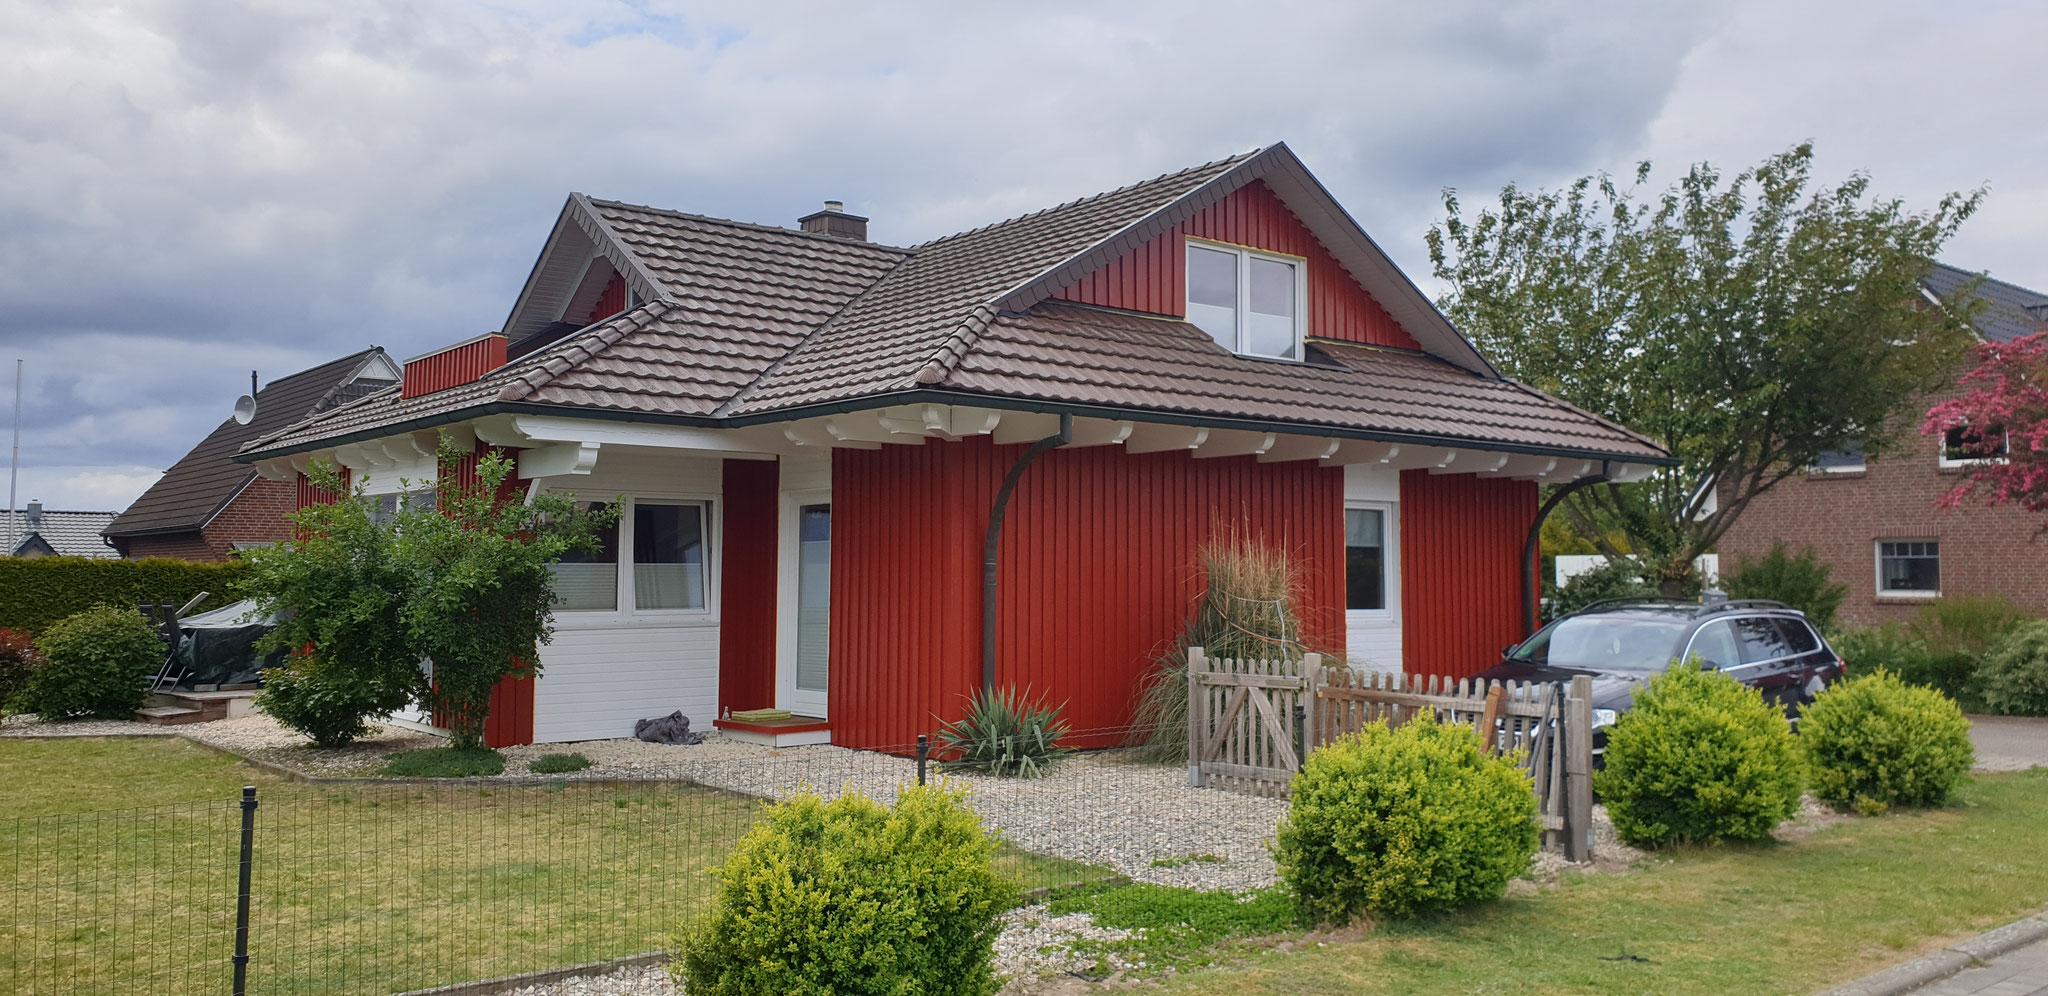 Fassadenrenovierung